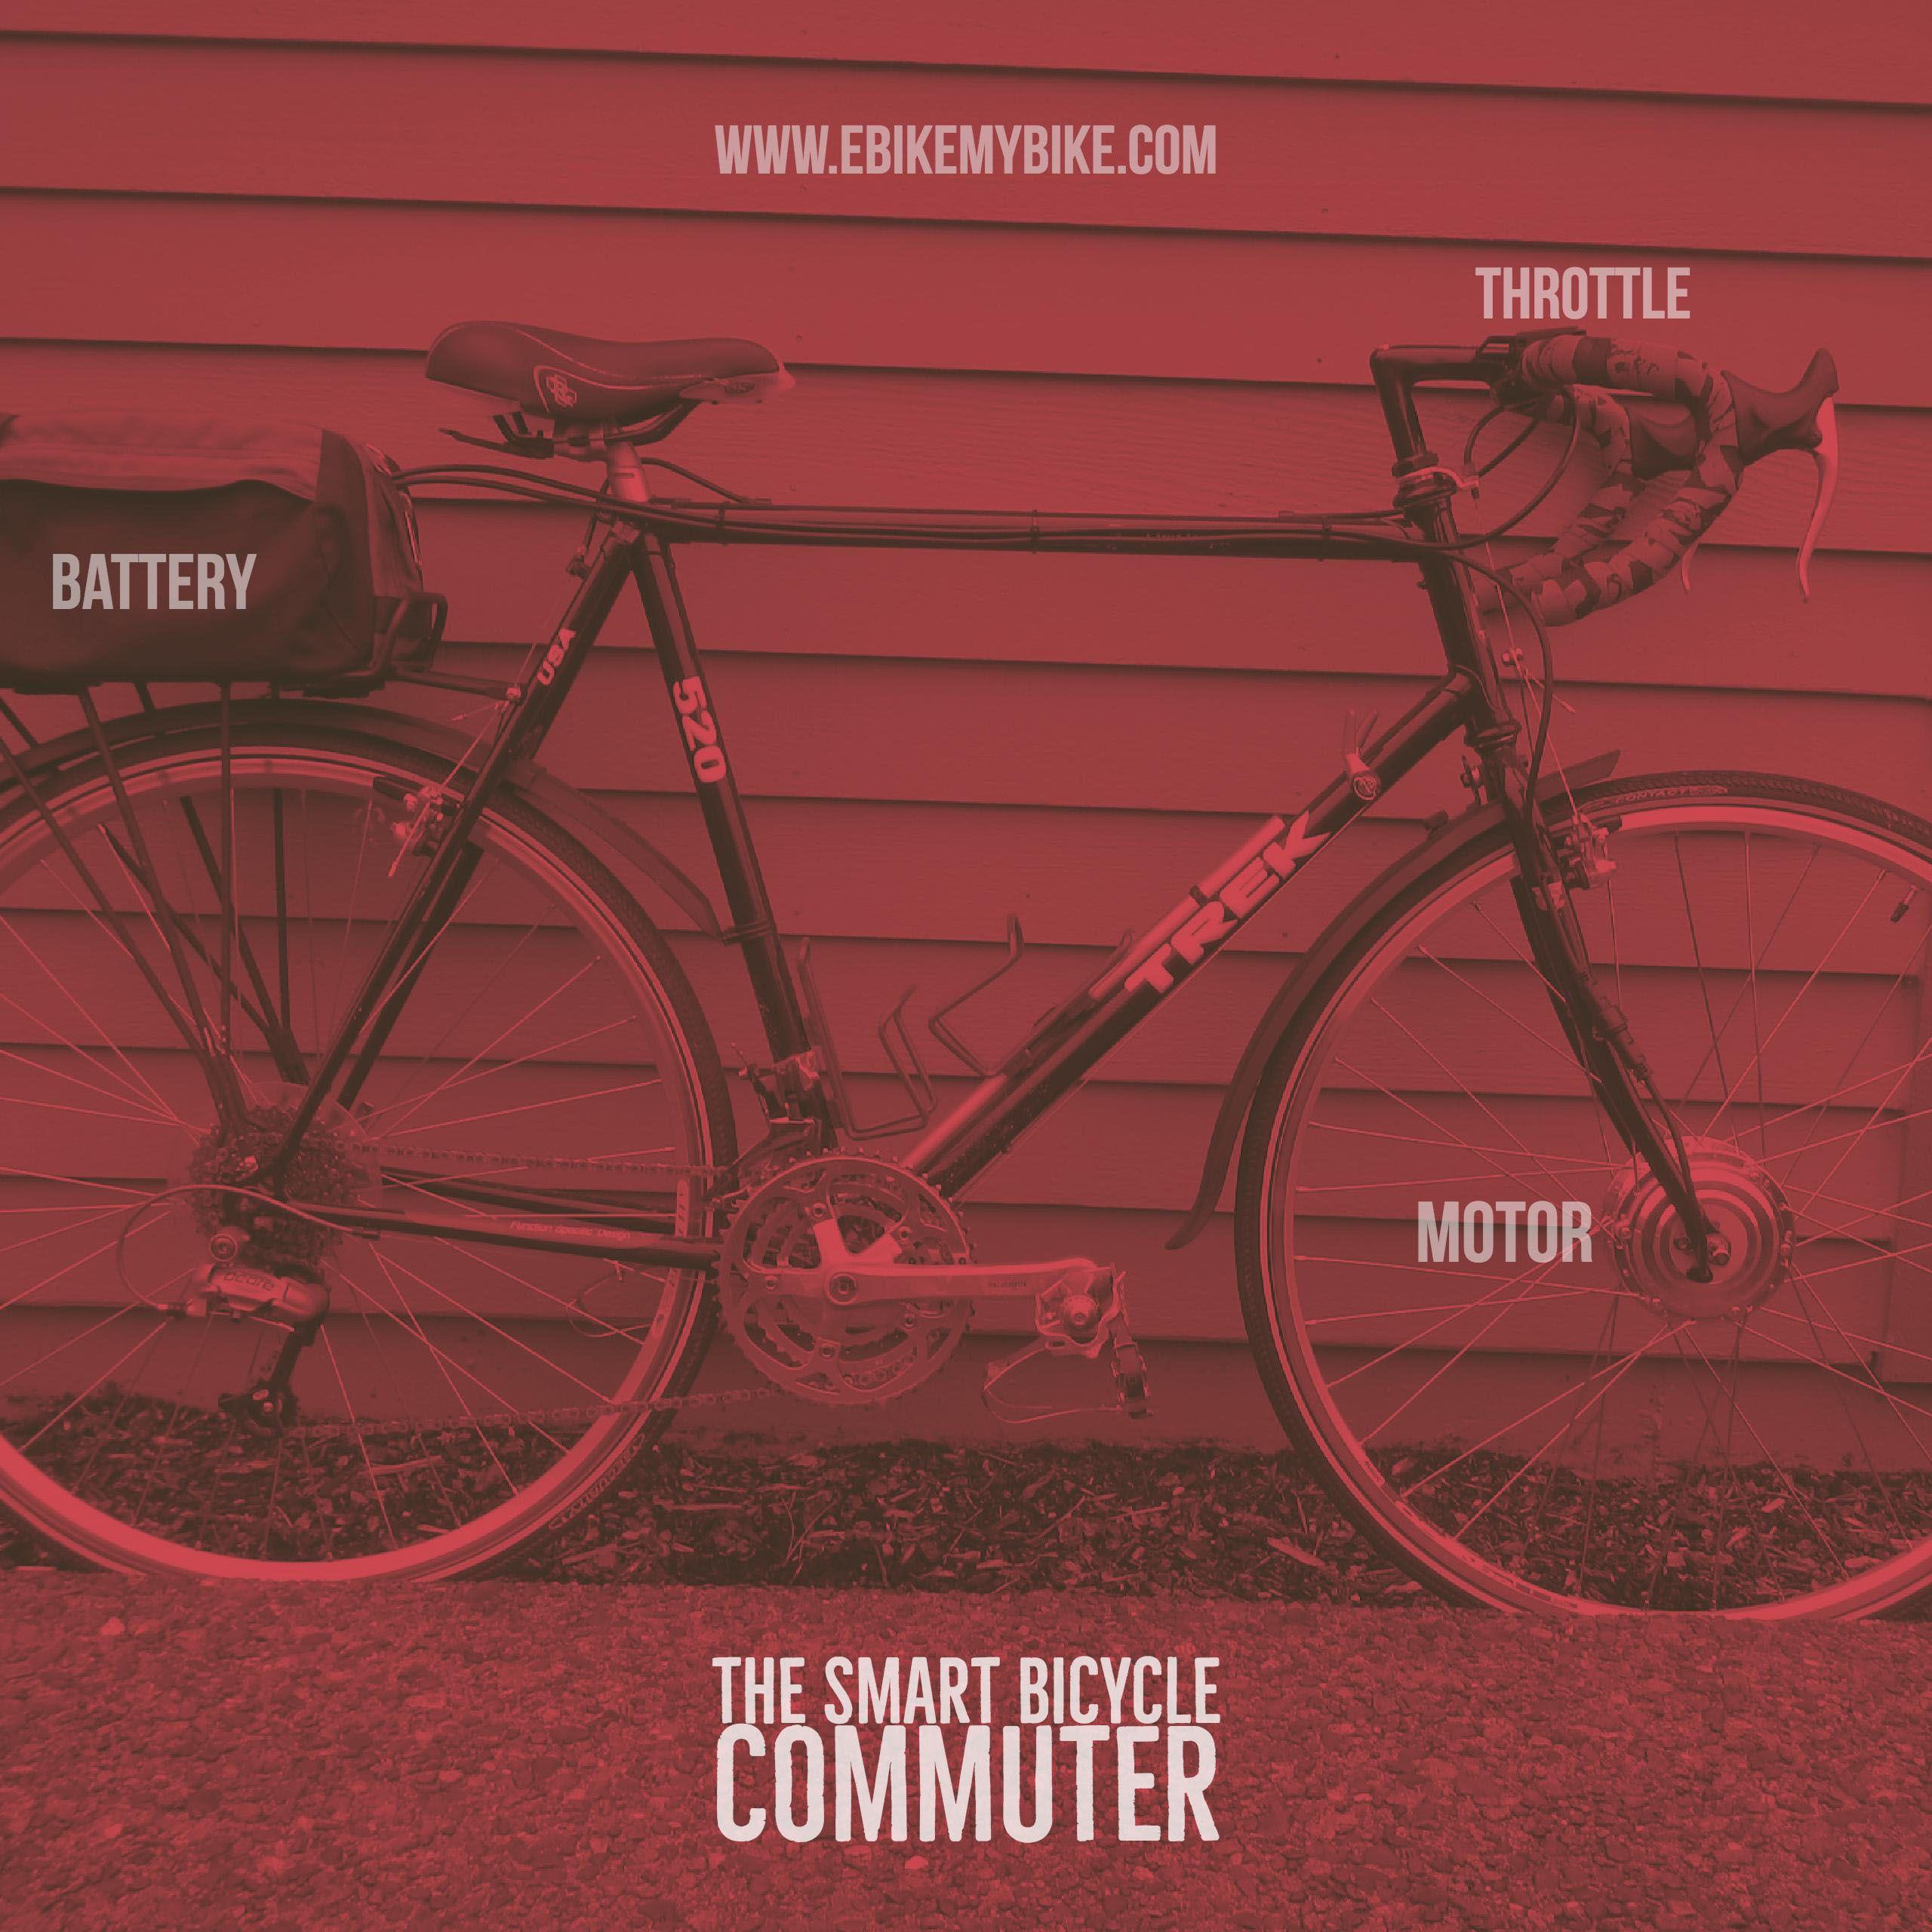 Leed Electric Bike Kit Meme 52 Jpg Electric Bike Kits Commuter